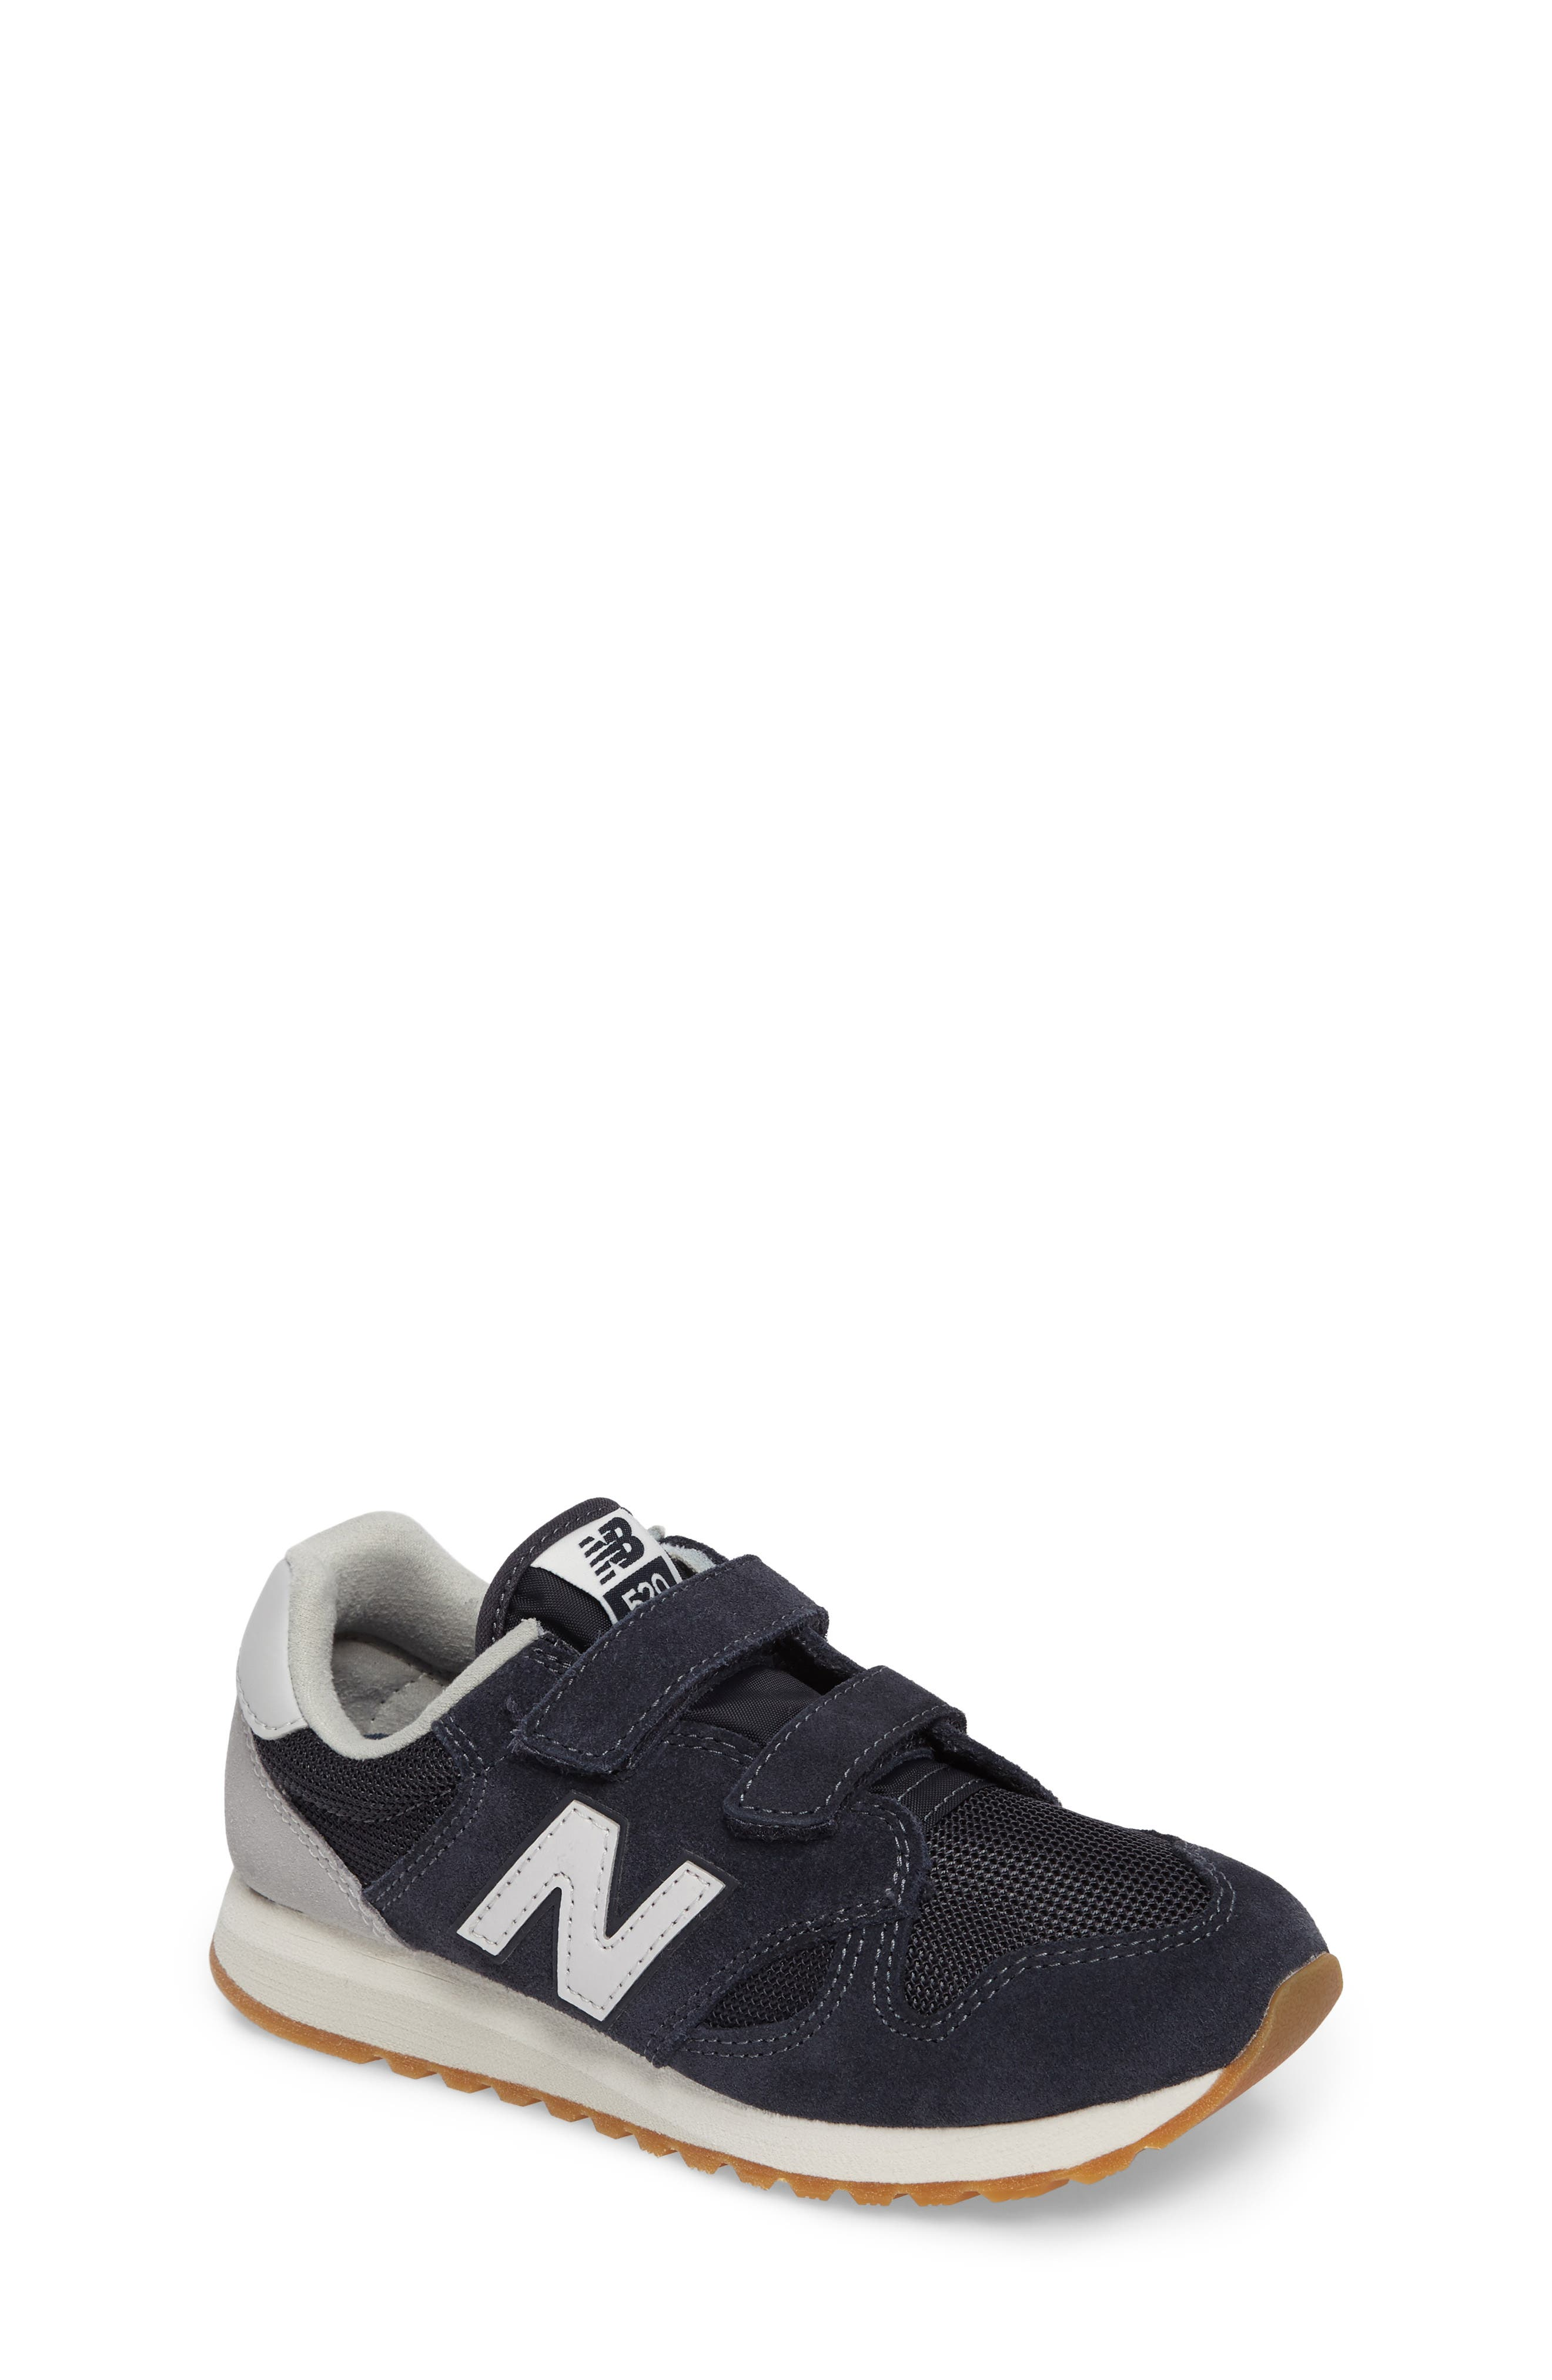 520 Sneaker,                         Main,                         color, Blue